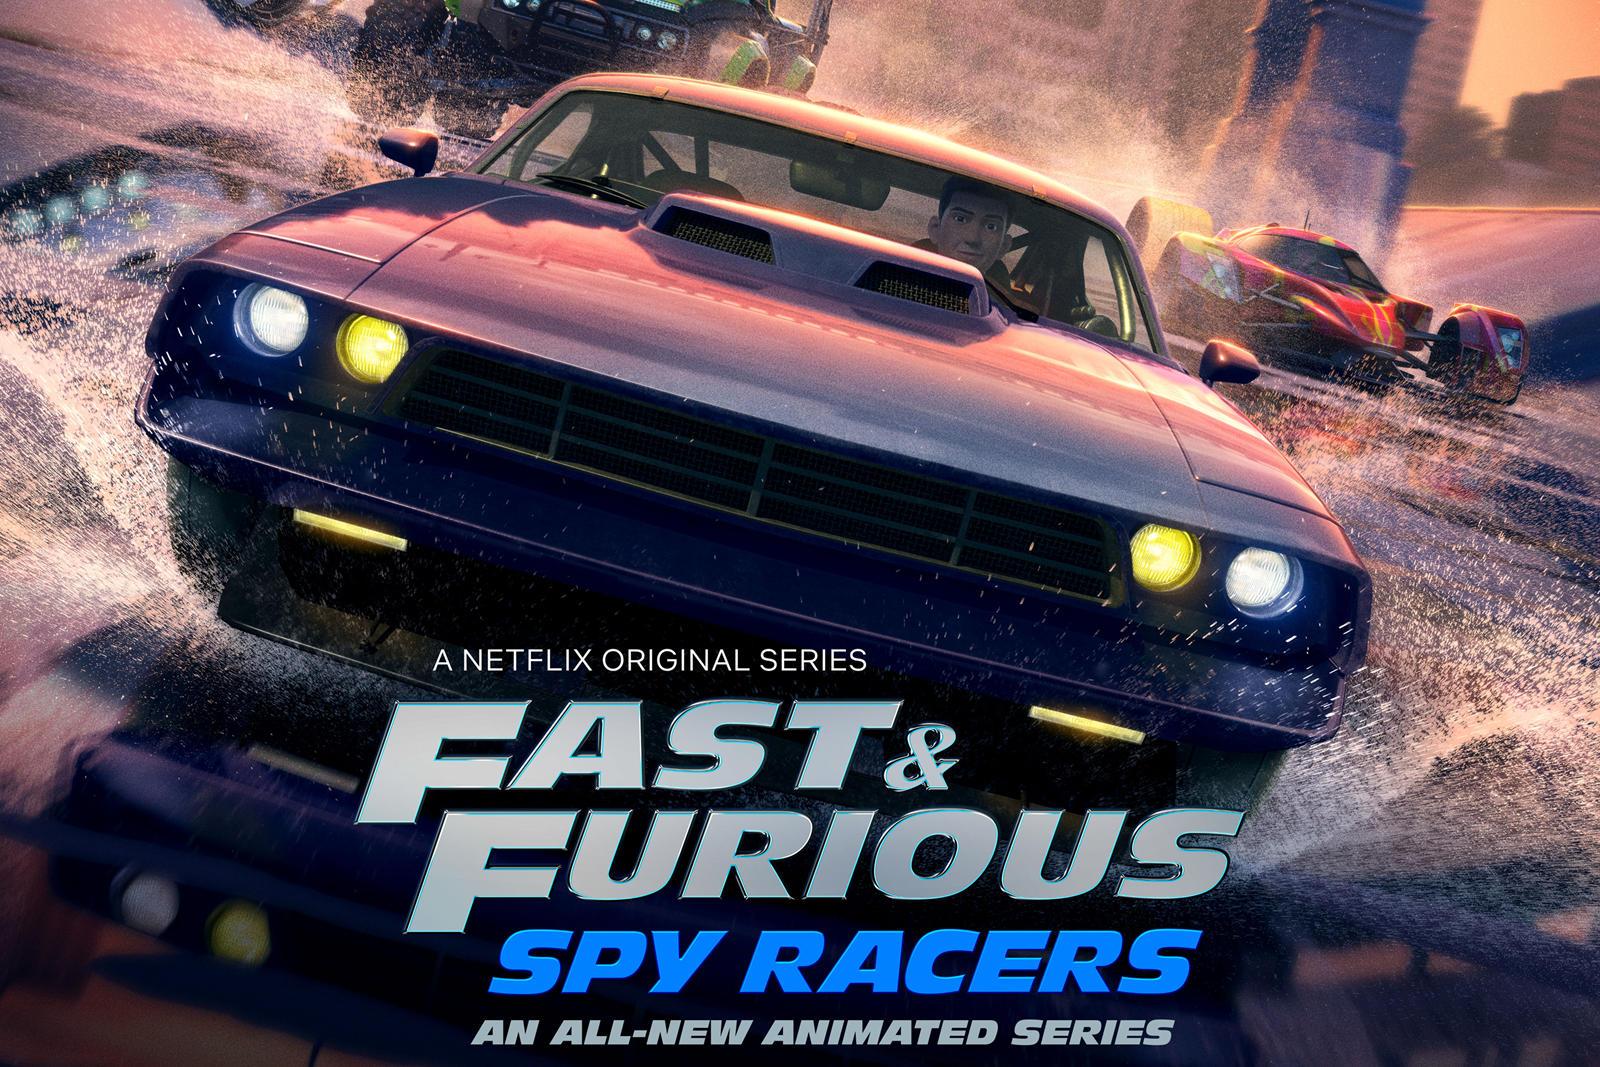 Fast & Furious : Les espions dans la course (5 ép) / Netflix